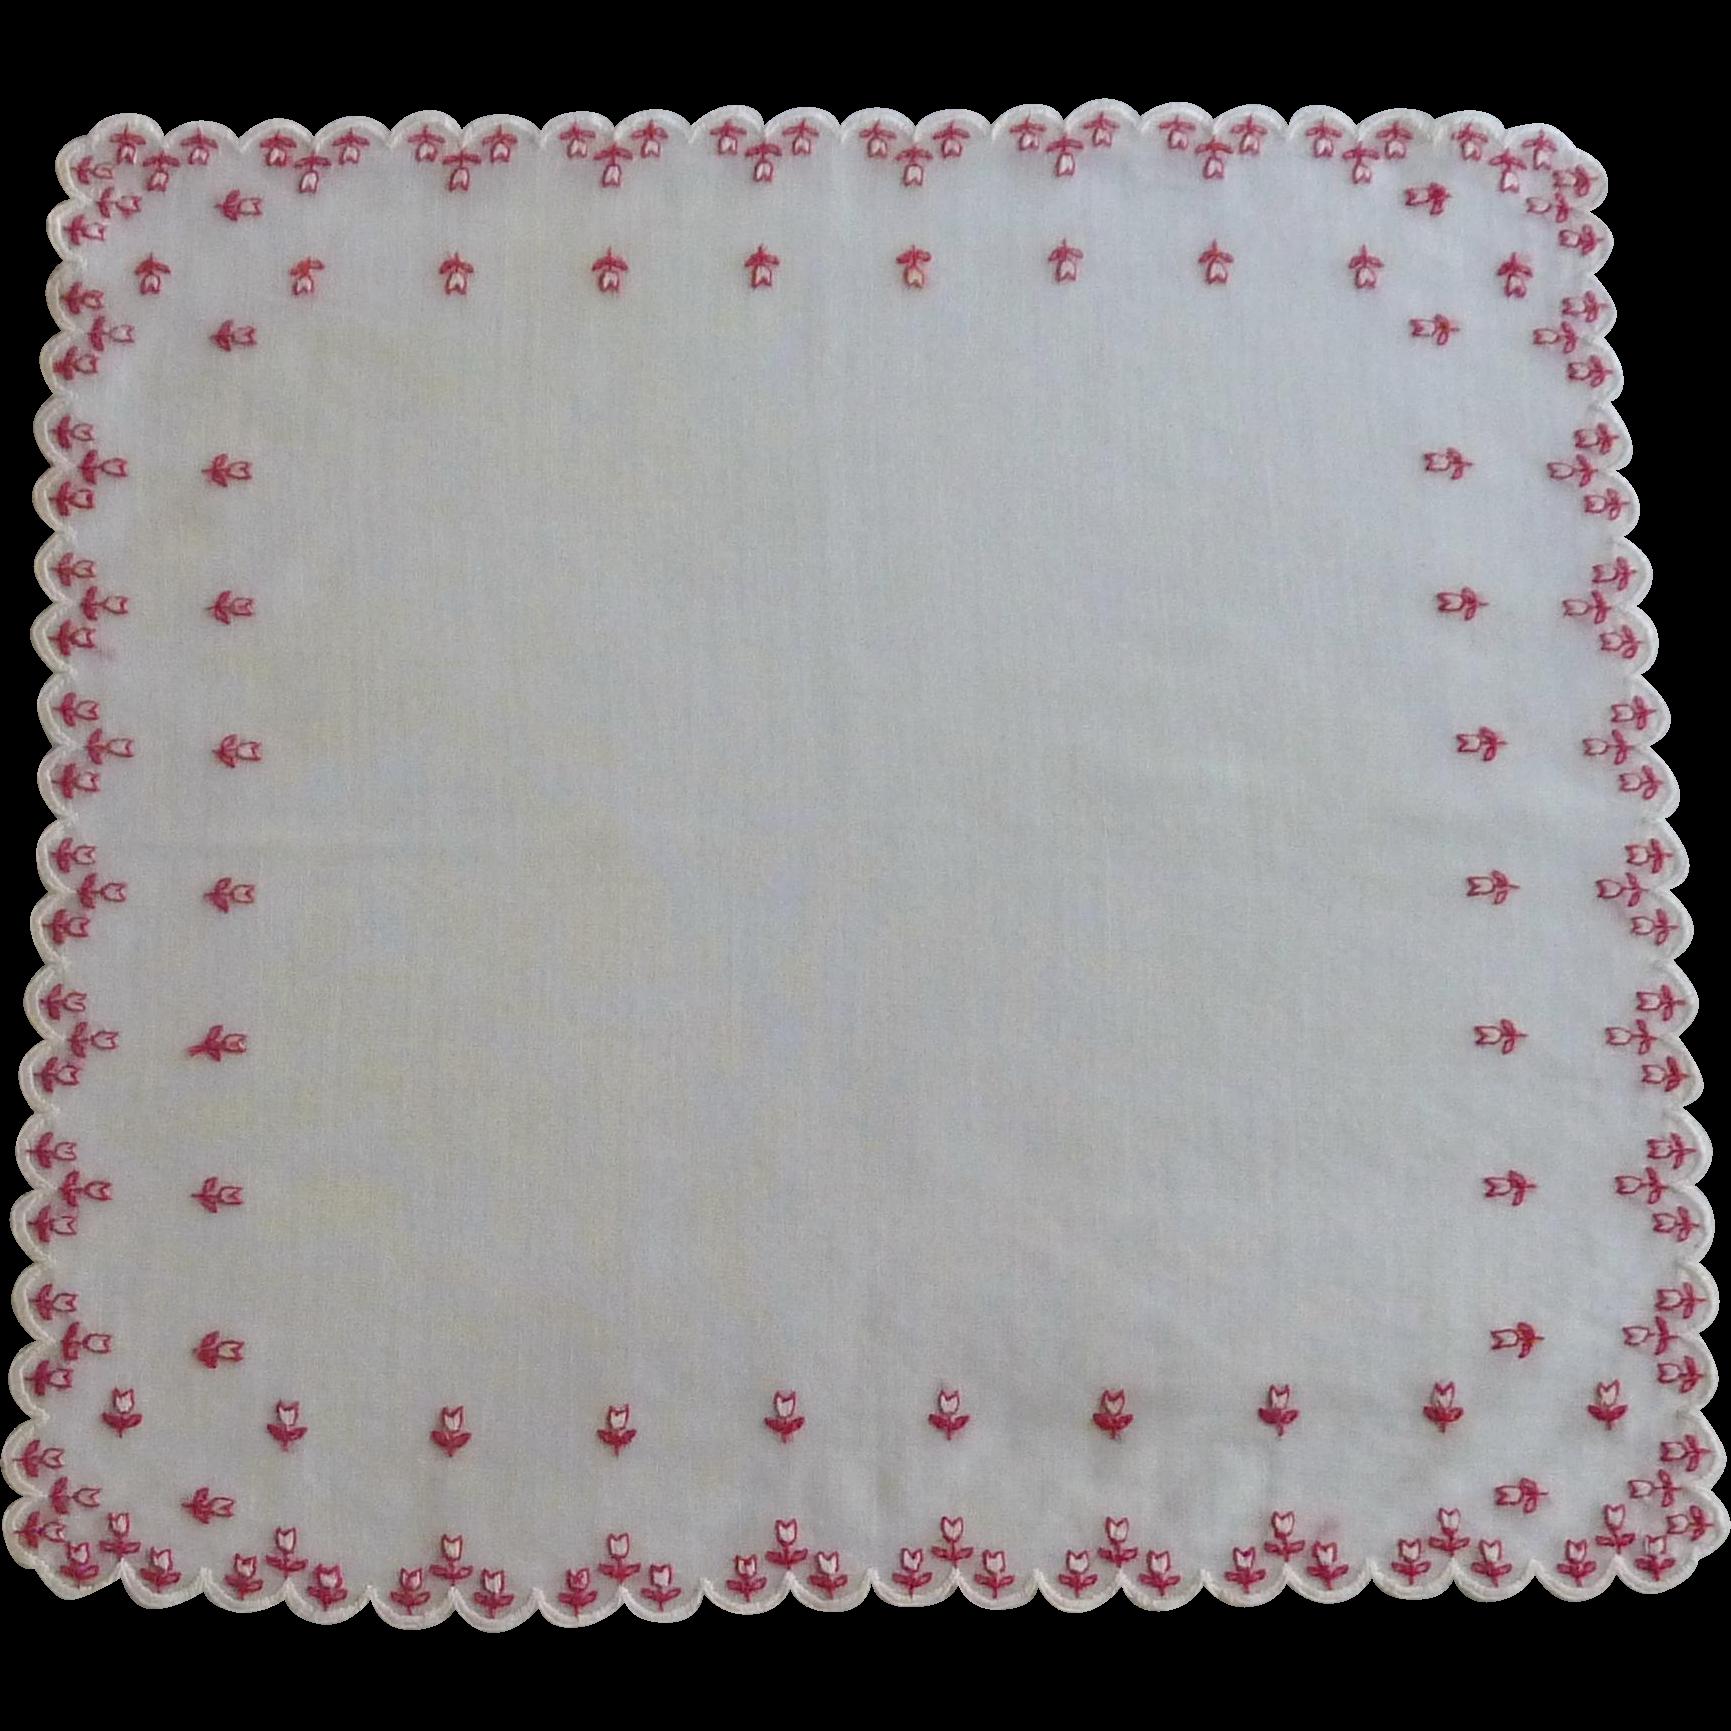 White Handkerchief with Tiny Red Tulip Handkerchief